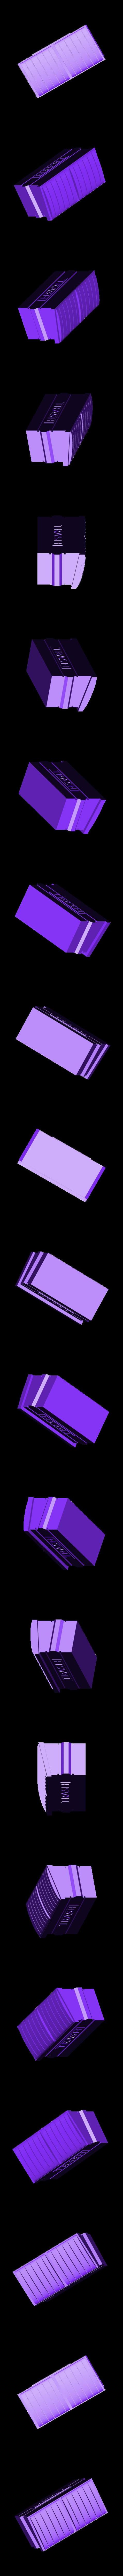 Dumpster_No_Hex.stl Download free STL file Hex Terrain City Set 1 • Model to 3D print, mrhers2